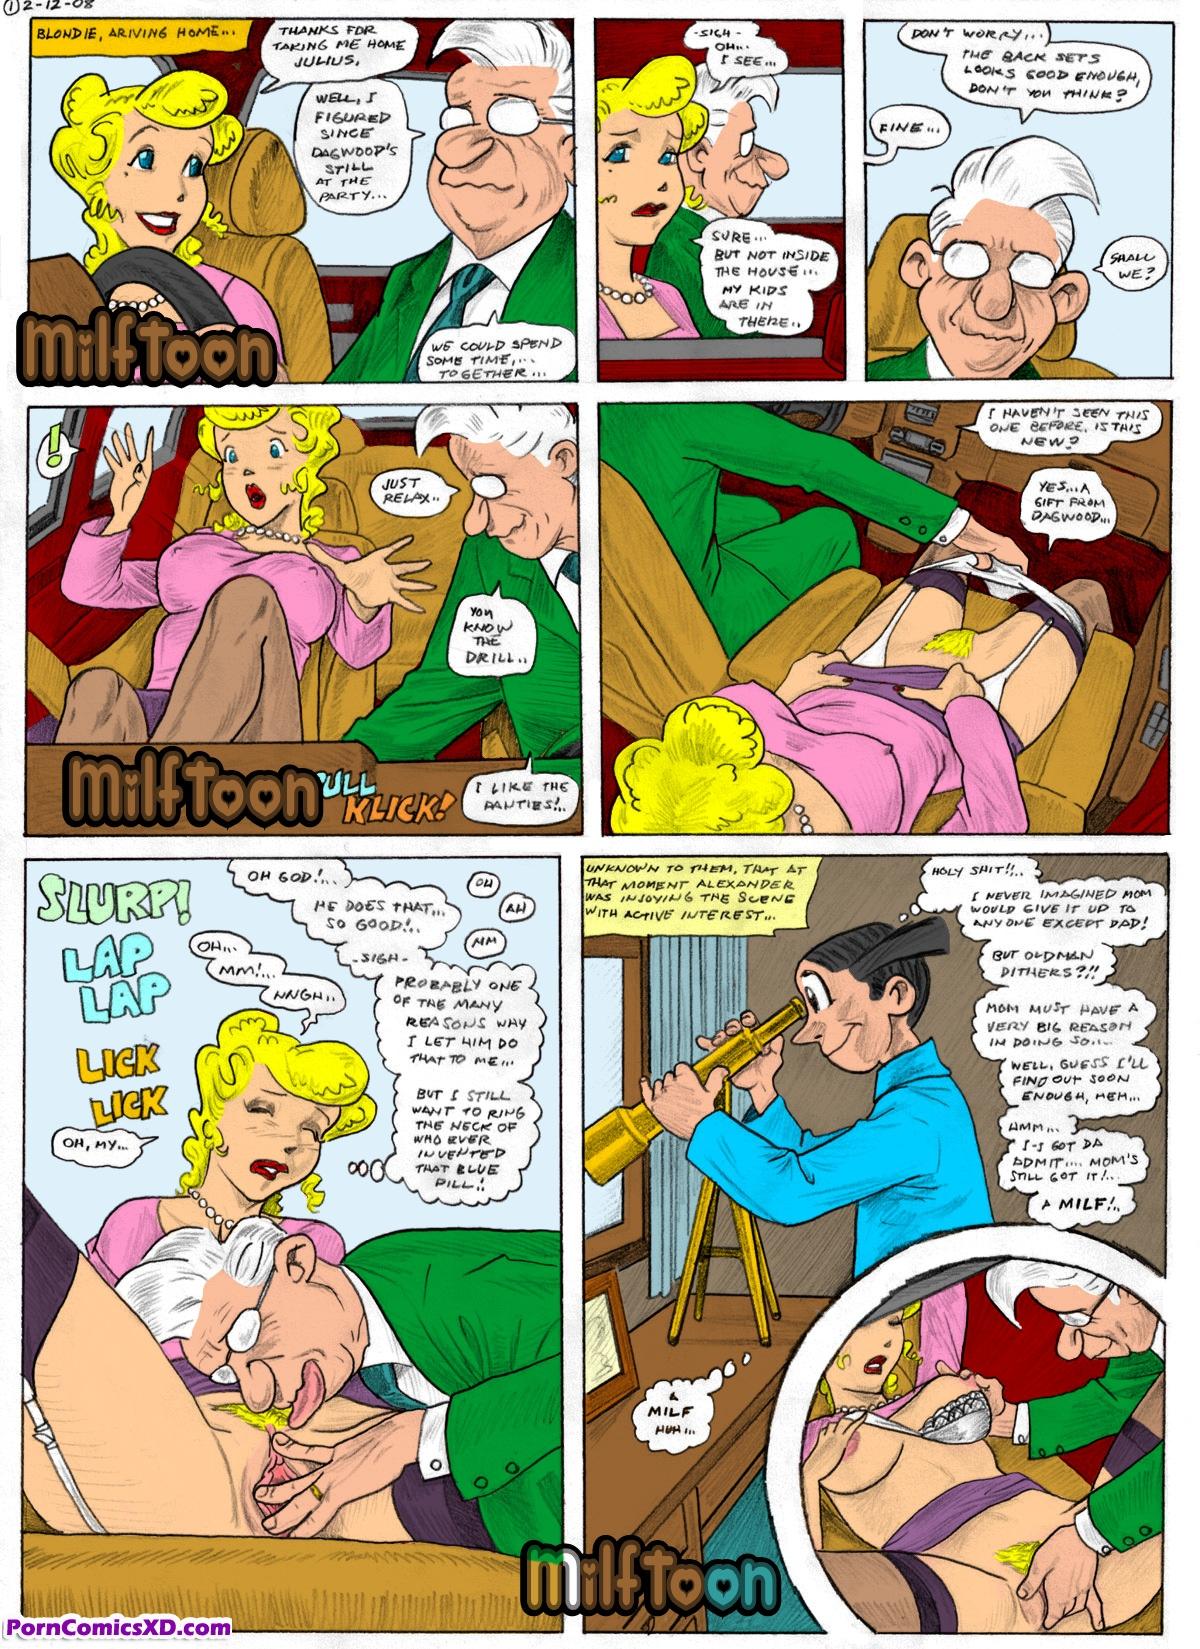 Порно комиксы blondie